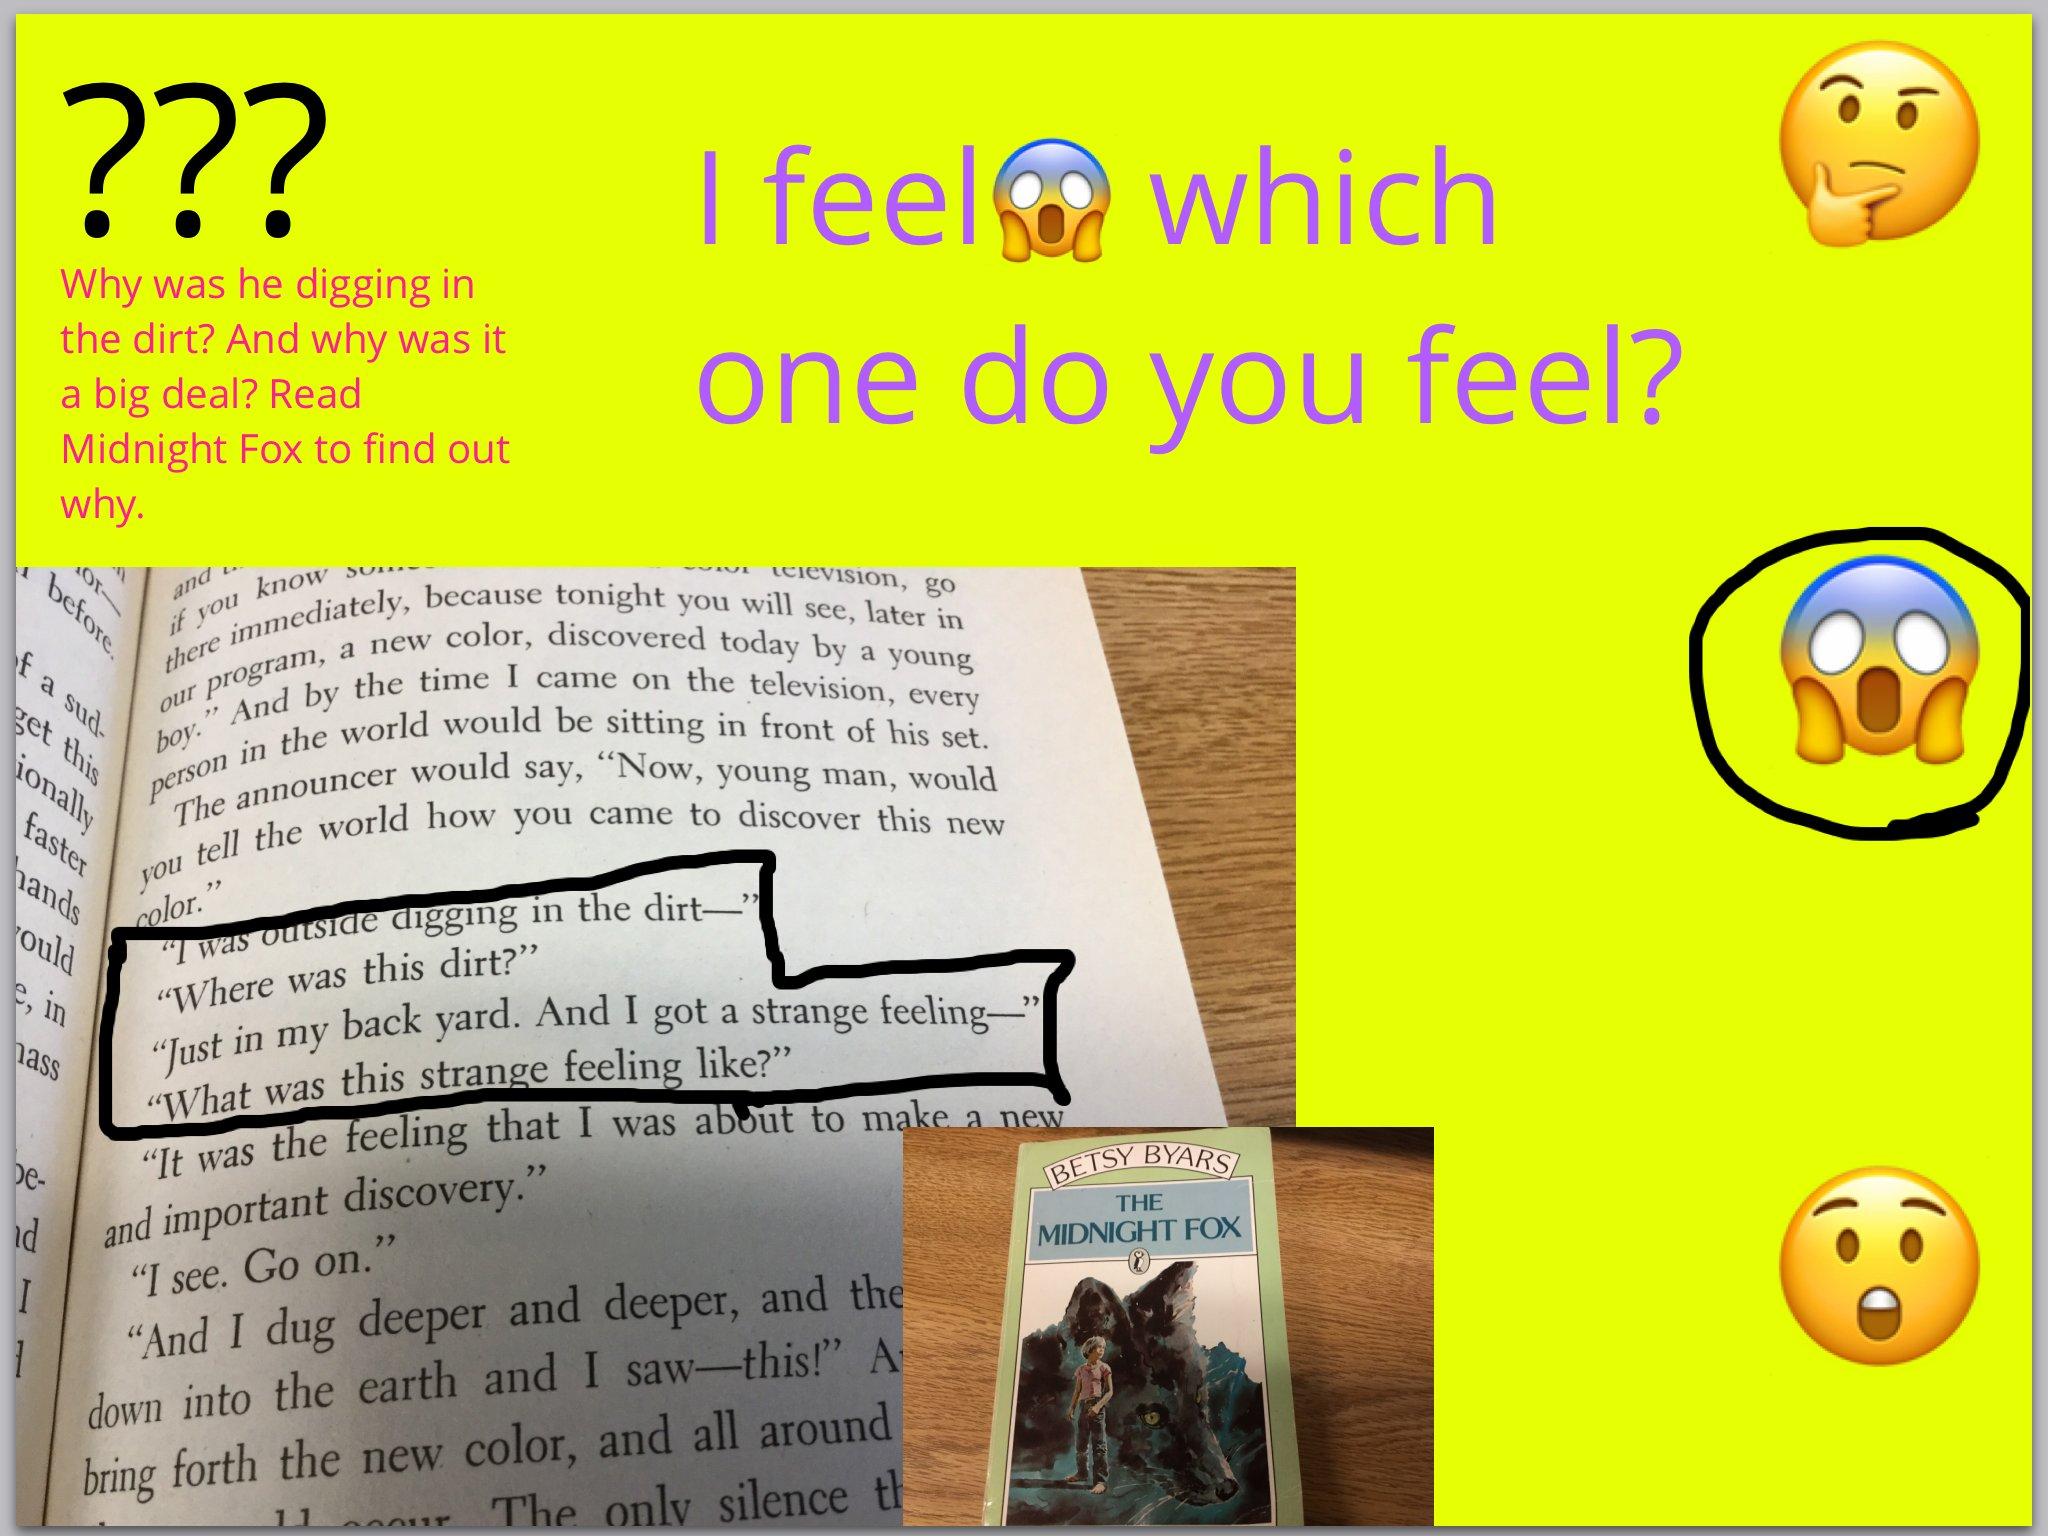 #booksnapswk2 #booksnaps KN_4Vo sharing Midnight Fox by #betsybyars @verovoig #betl https://t.co/Wf5ks5U0SZ